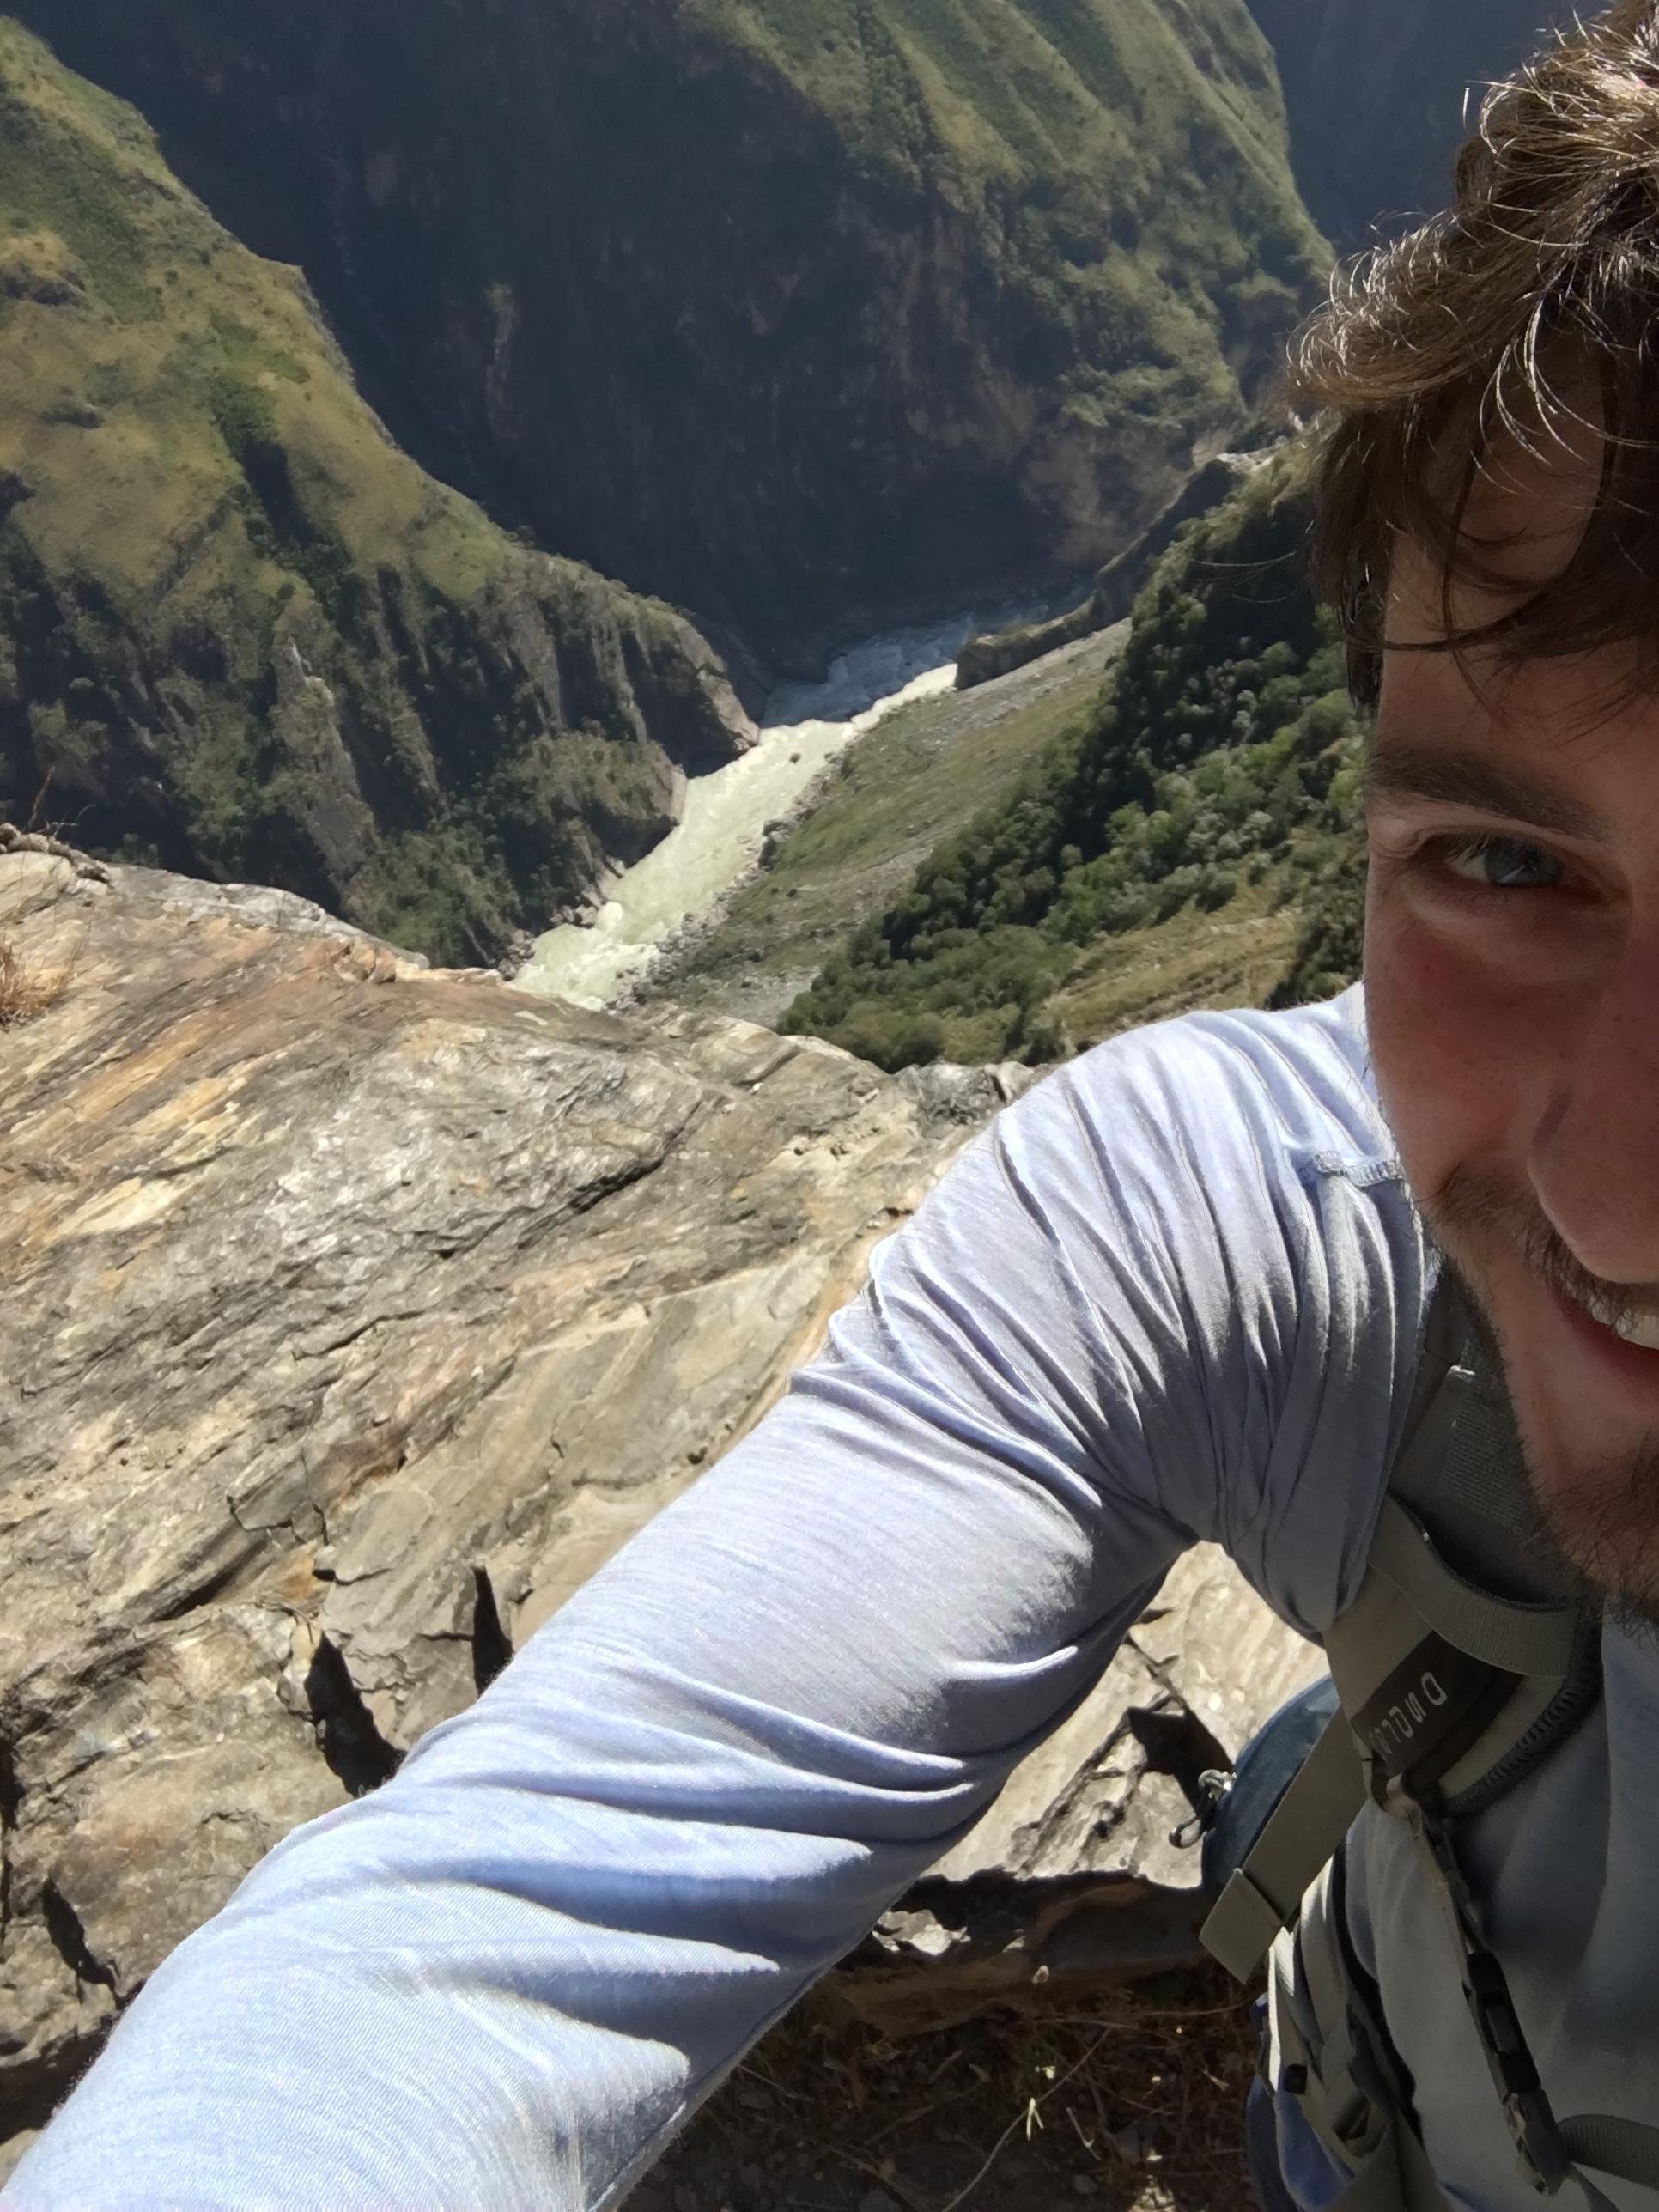 Selfie on the edge...